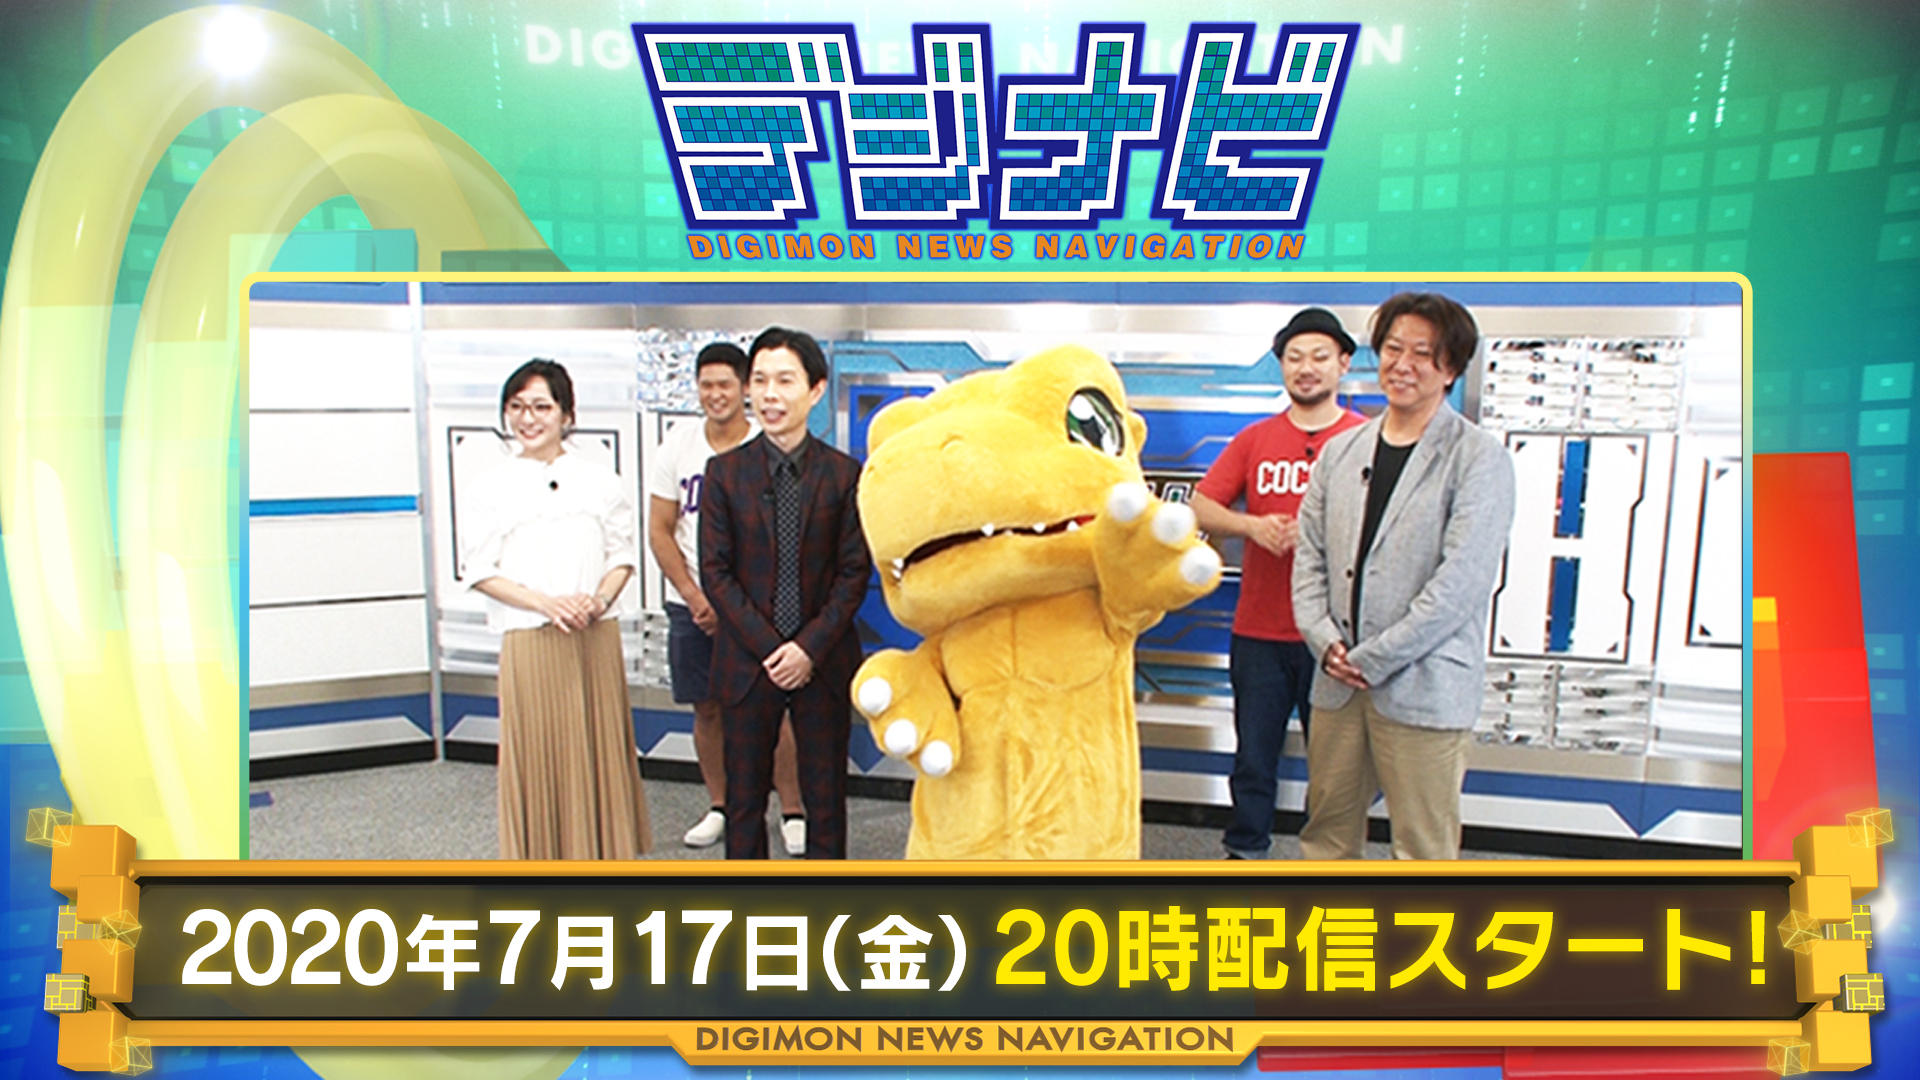 DigiNavi: Digimon News Navigation - July 17, 2020